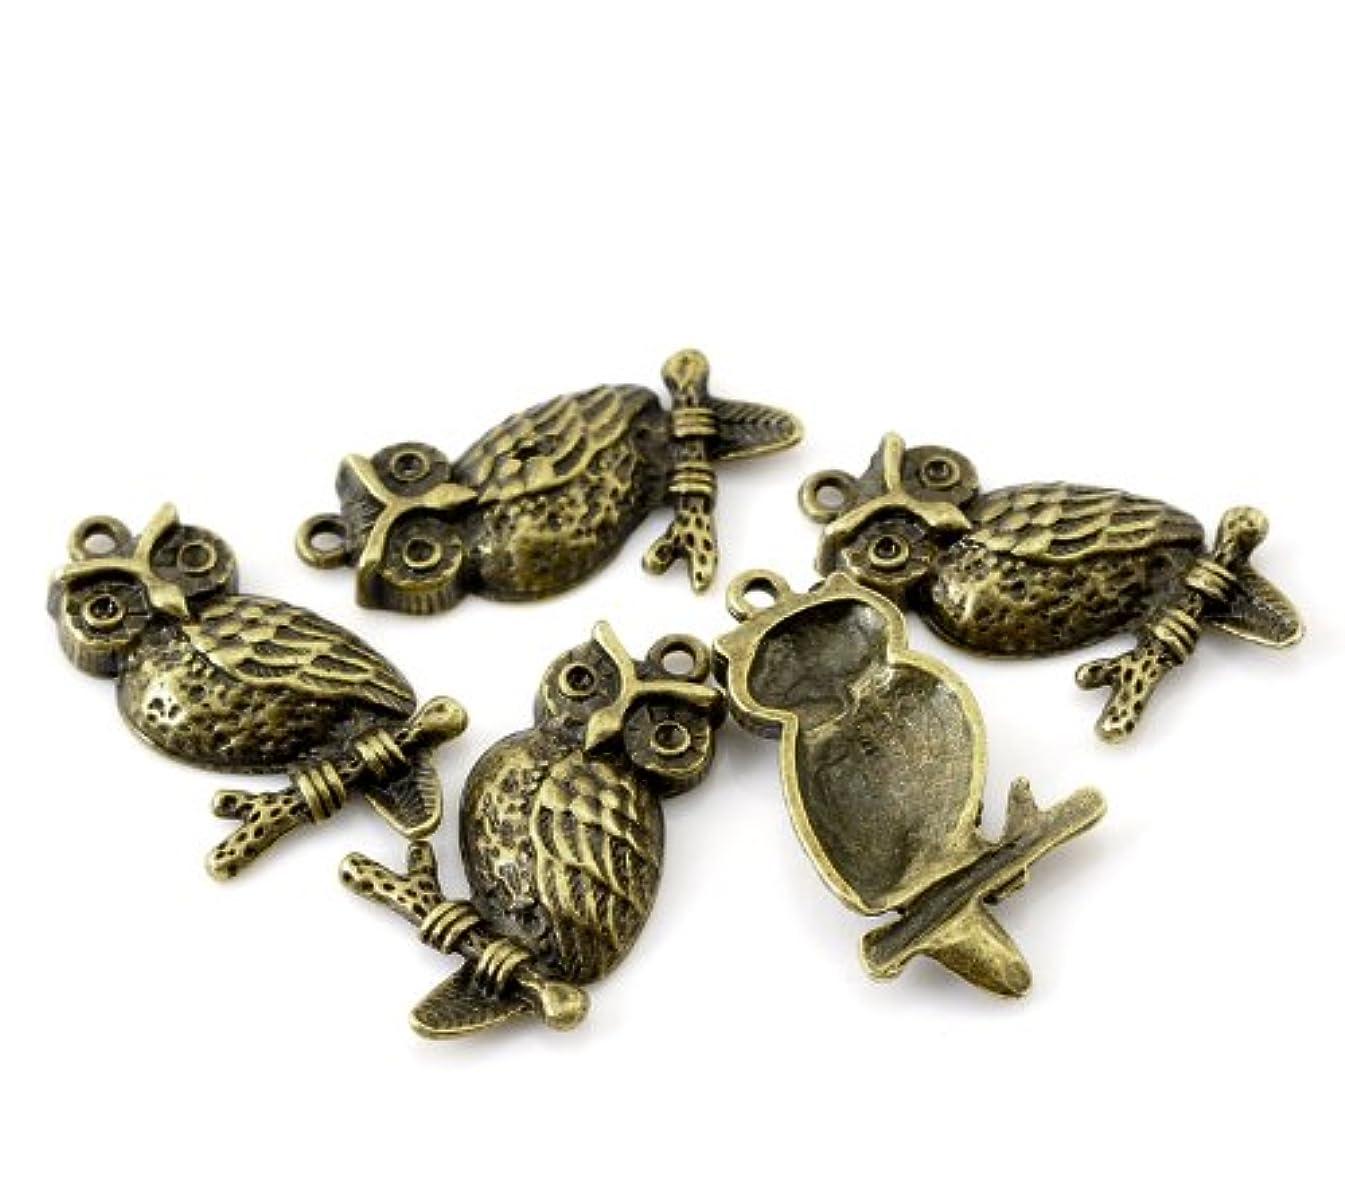 PEPPERLONELY Brand 20 PC Antique Bronze Halloween Ornaments Owl Charm Pendants 1-2/8 x 6/8 Inch (33MM x 18MM)